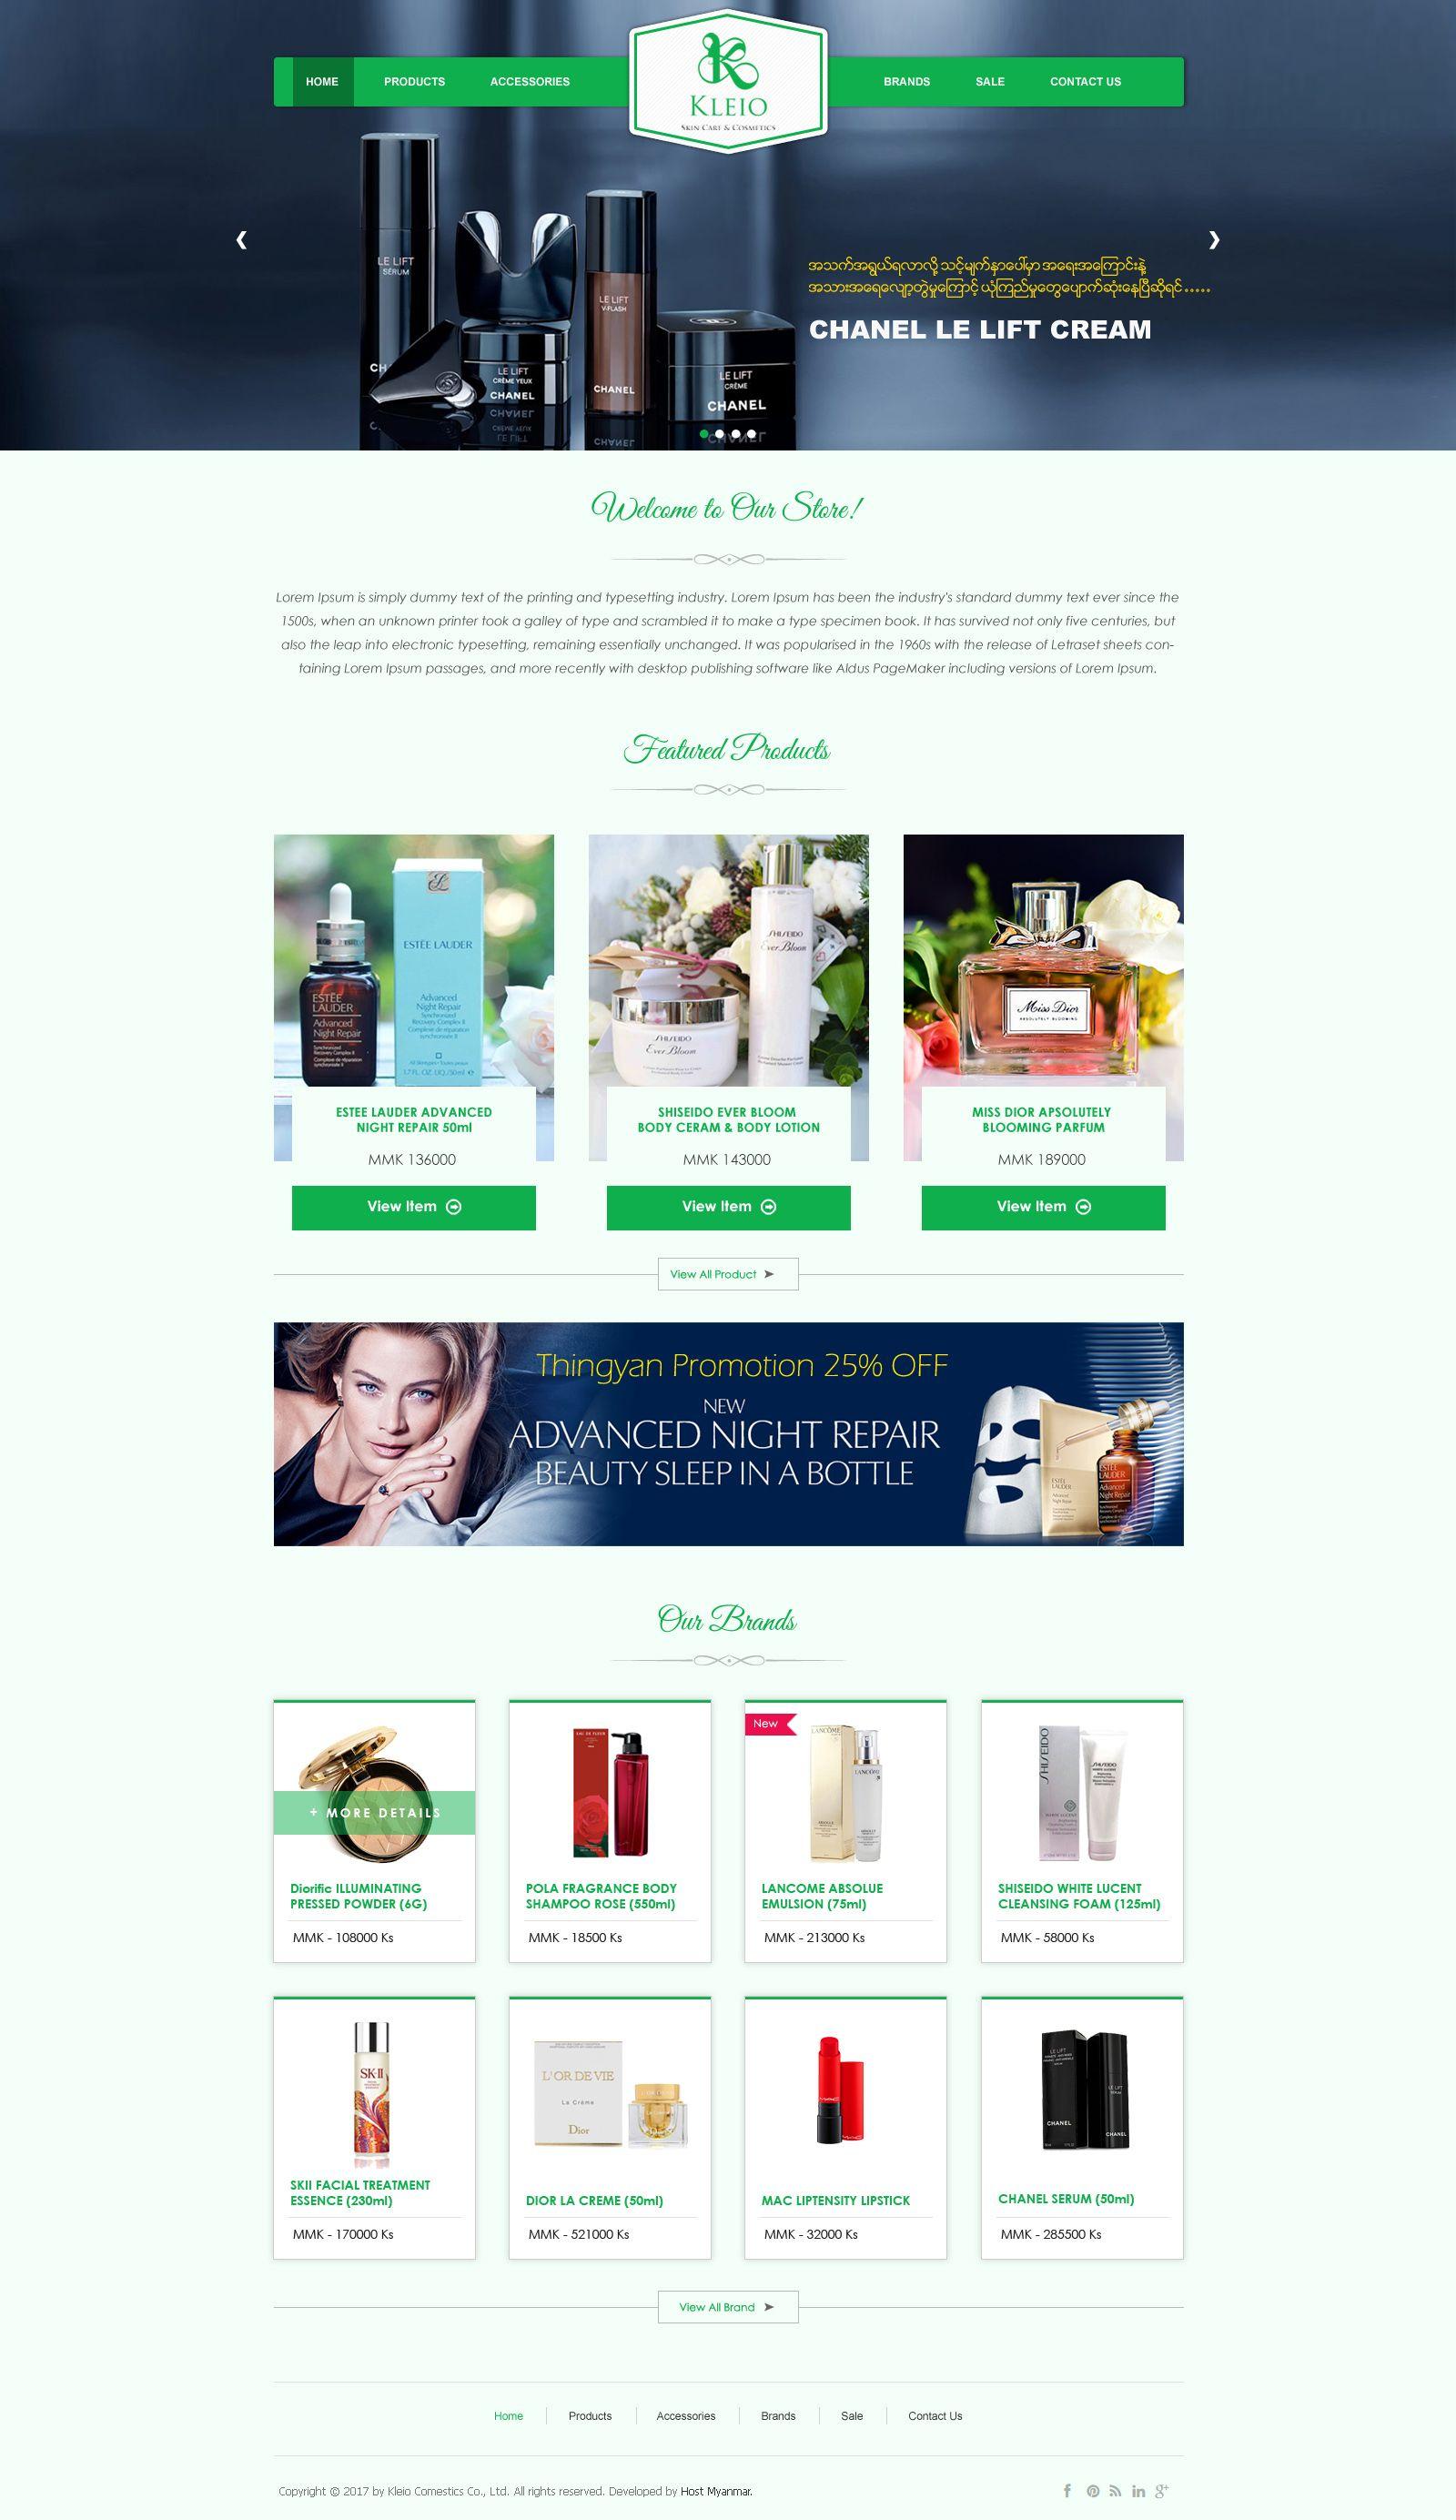 Kleio Cosmetic Myanmar | Web Design | Web design, Design, Cosmetics